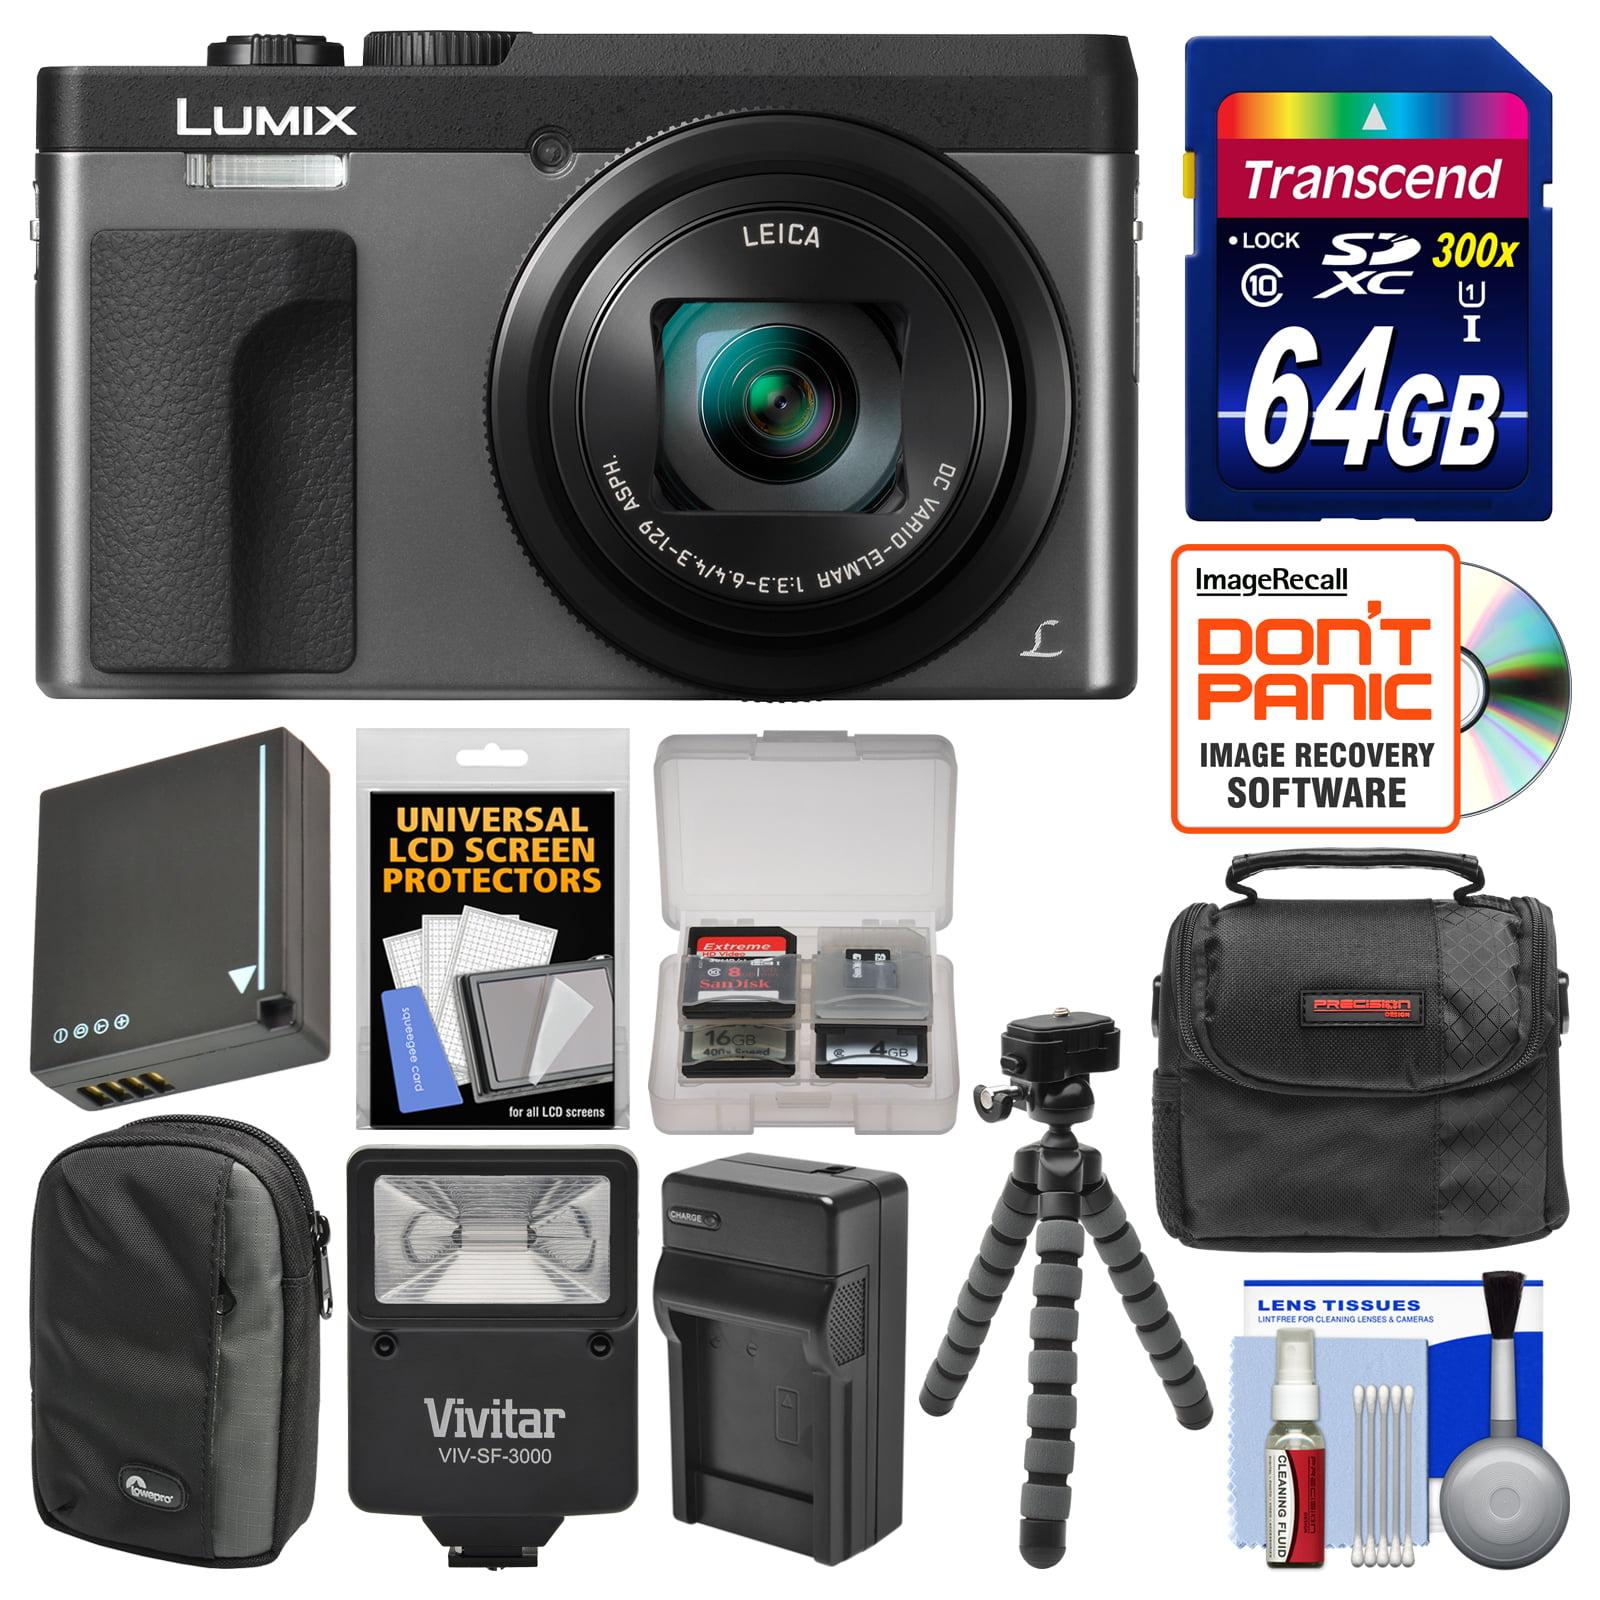 Panasonic Lumix DC-ZS70 4K Wi-Fi Digital Camera (Black) with 64GB Card + Case + Flash + Battery + Charger + Tripod + Kit